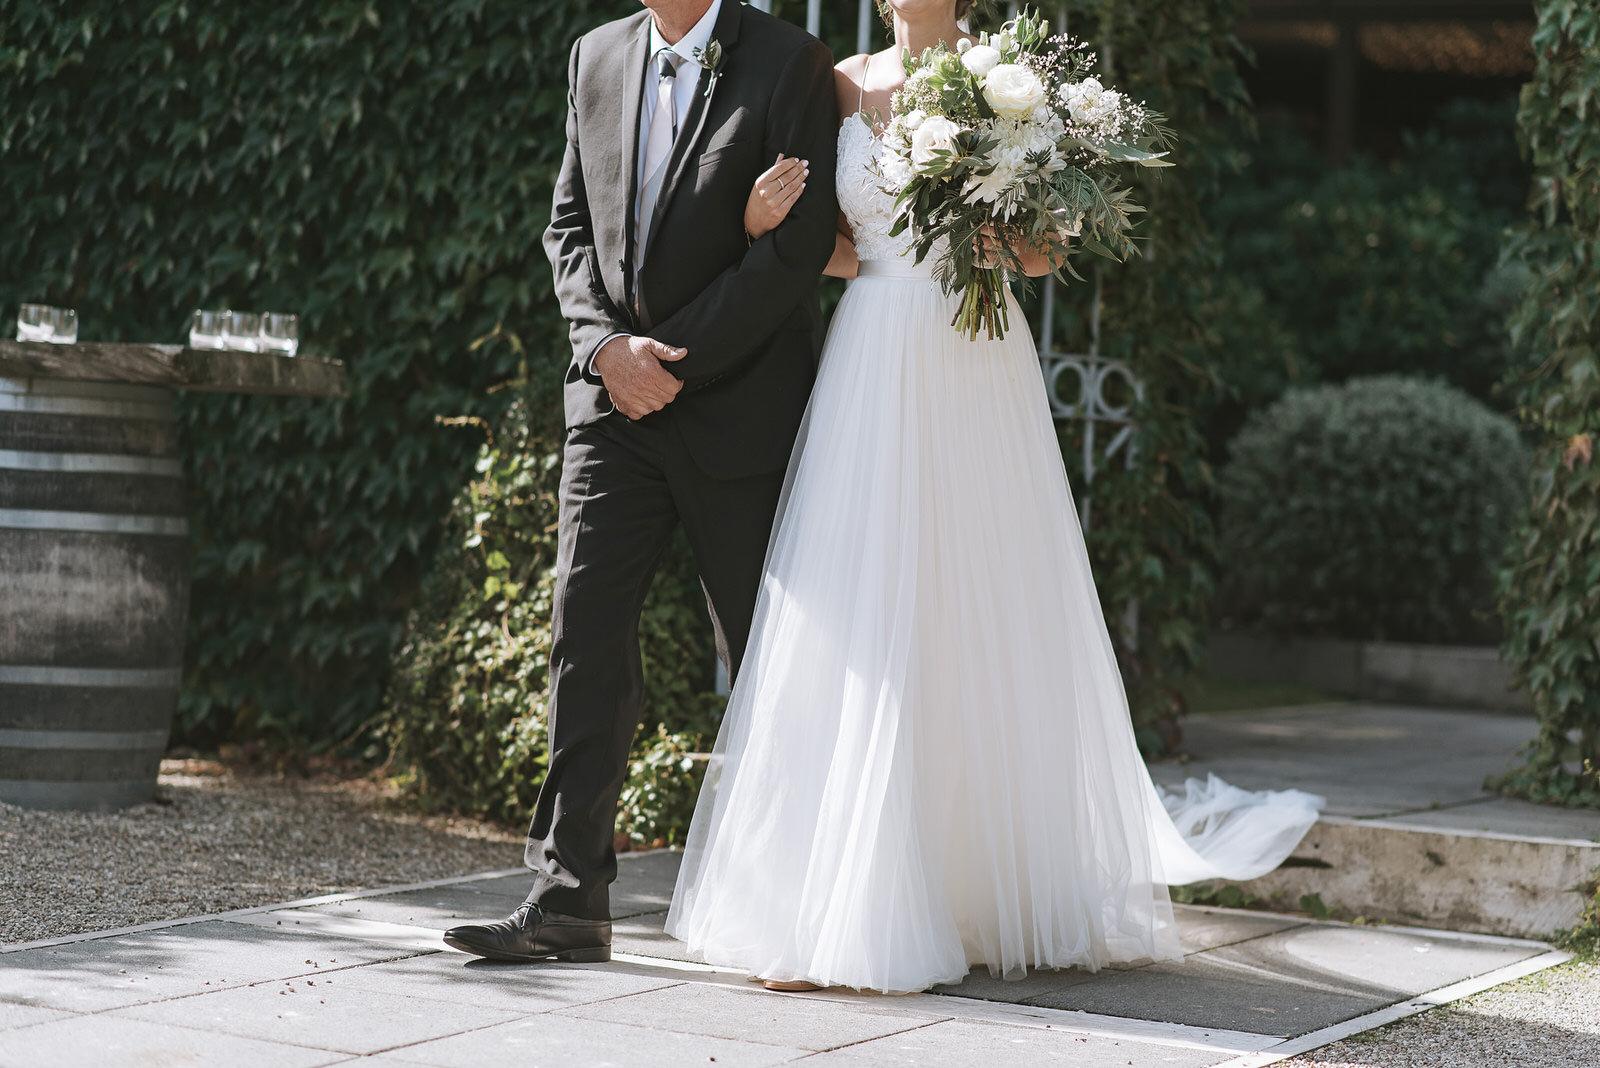 newfound-r-s-ataahua-garden-venue-tauranga-wedding-054